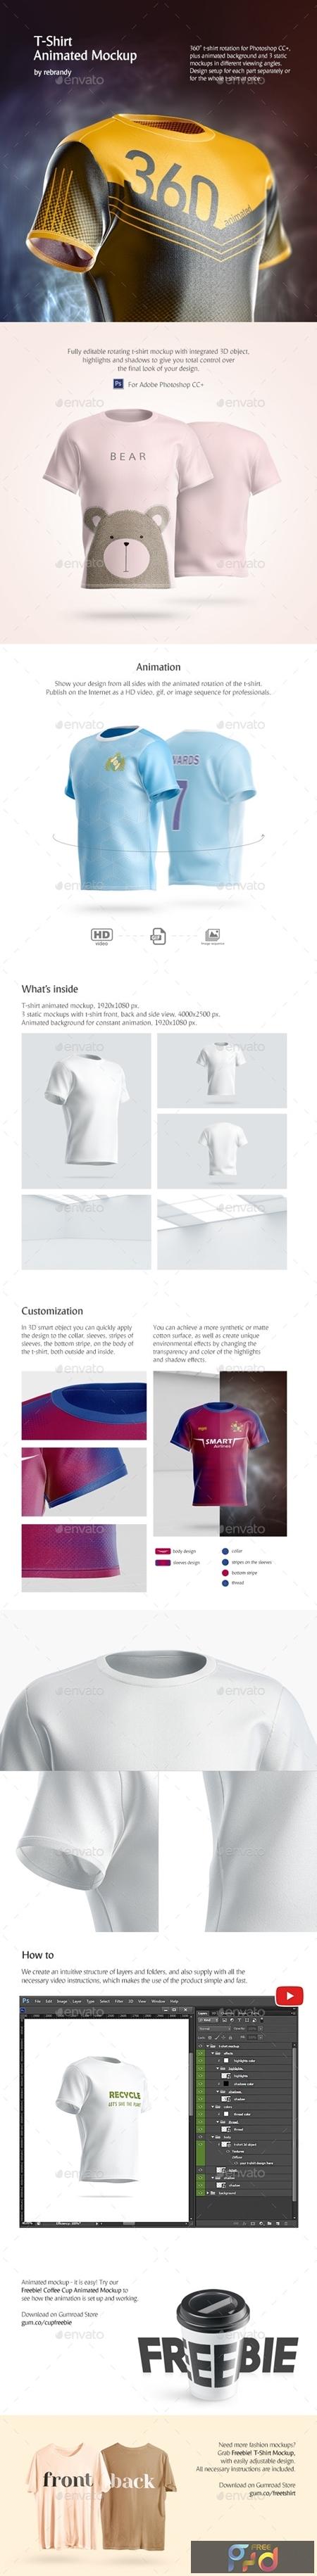 T-Shirt Animated Mockup 24720128 1